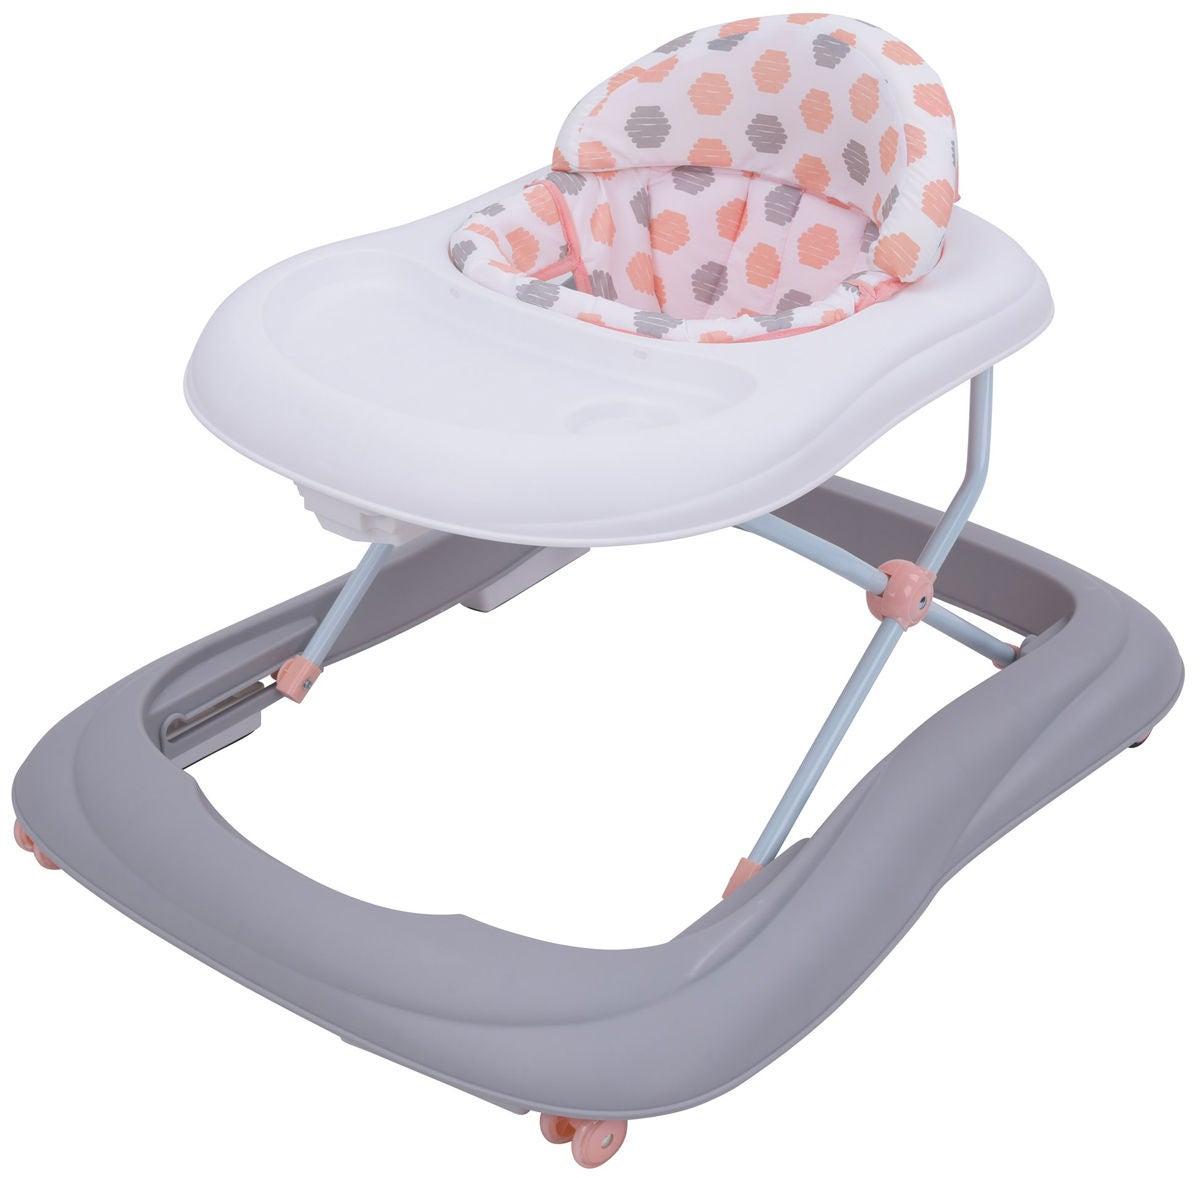 BabyDan Kävelytuoli, Peach